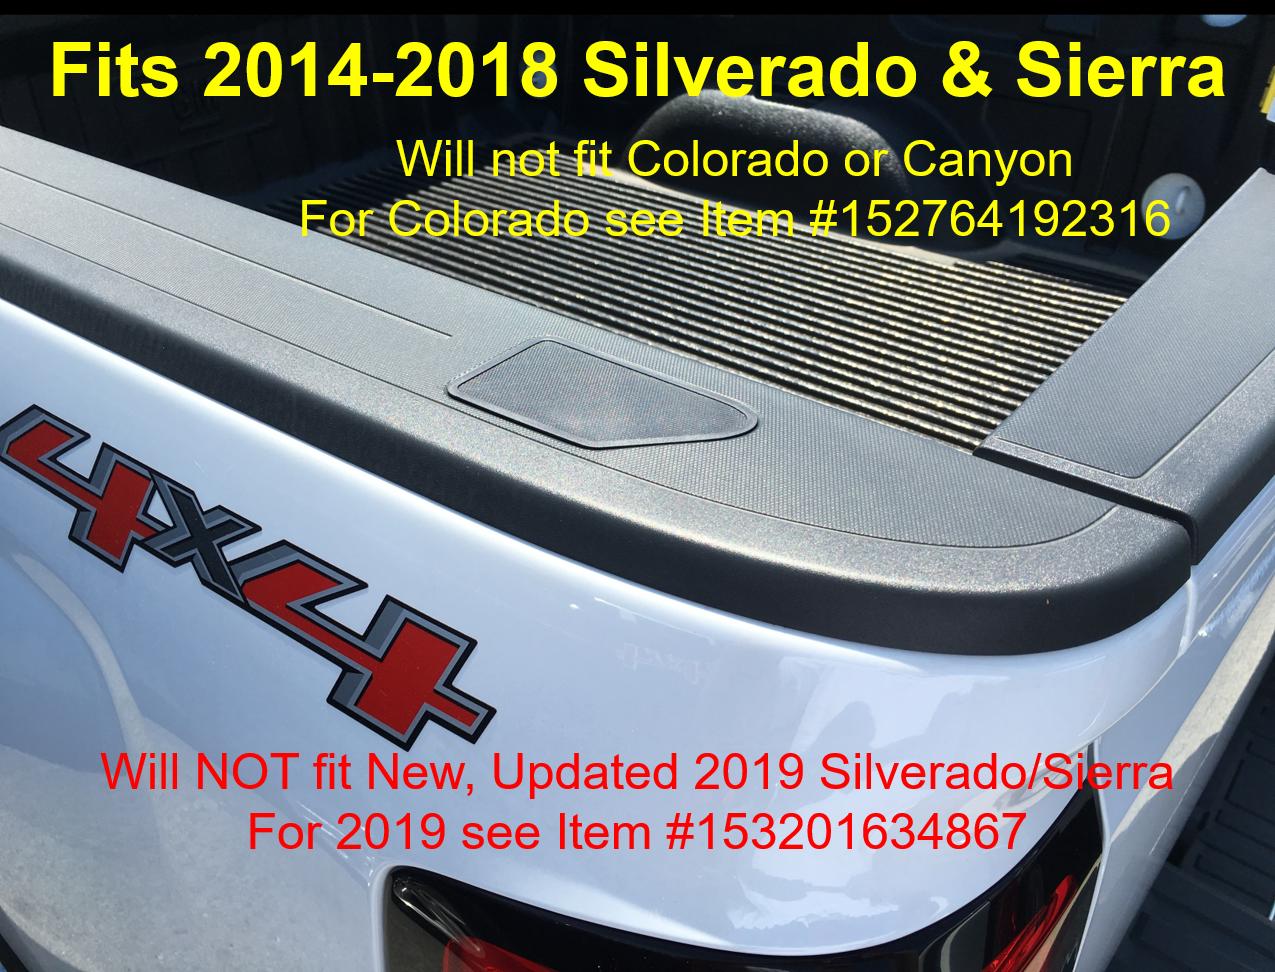 Stake Pocket Covers Caps Rail Hole Plugs 2014-2018 Silverado Sierra Accessories 2